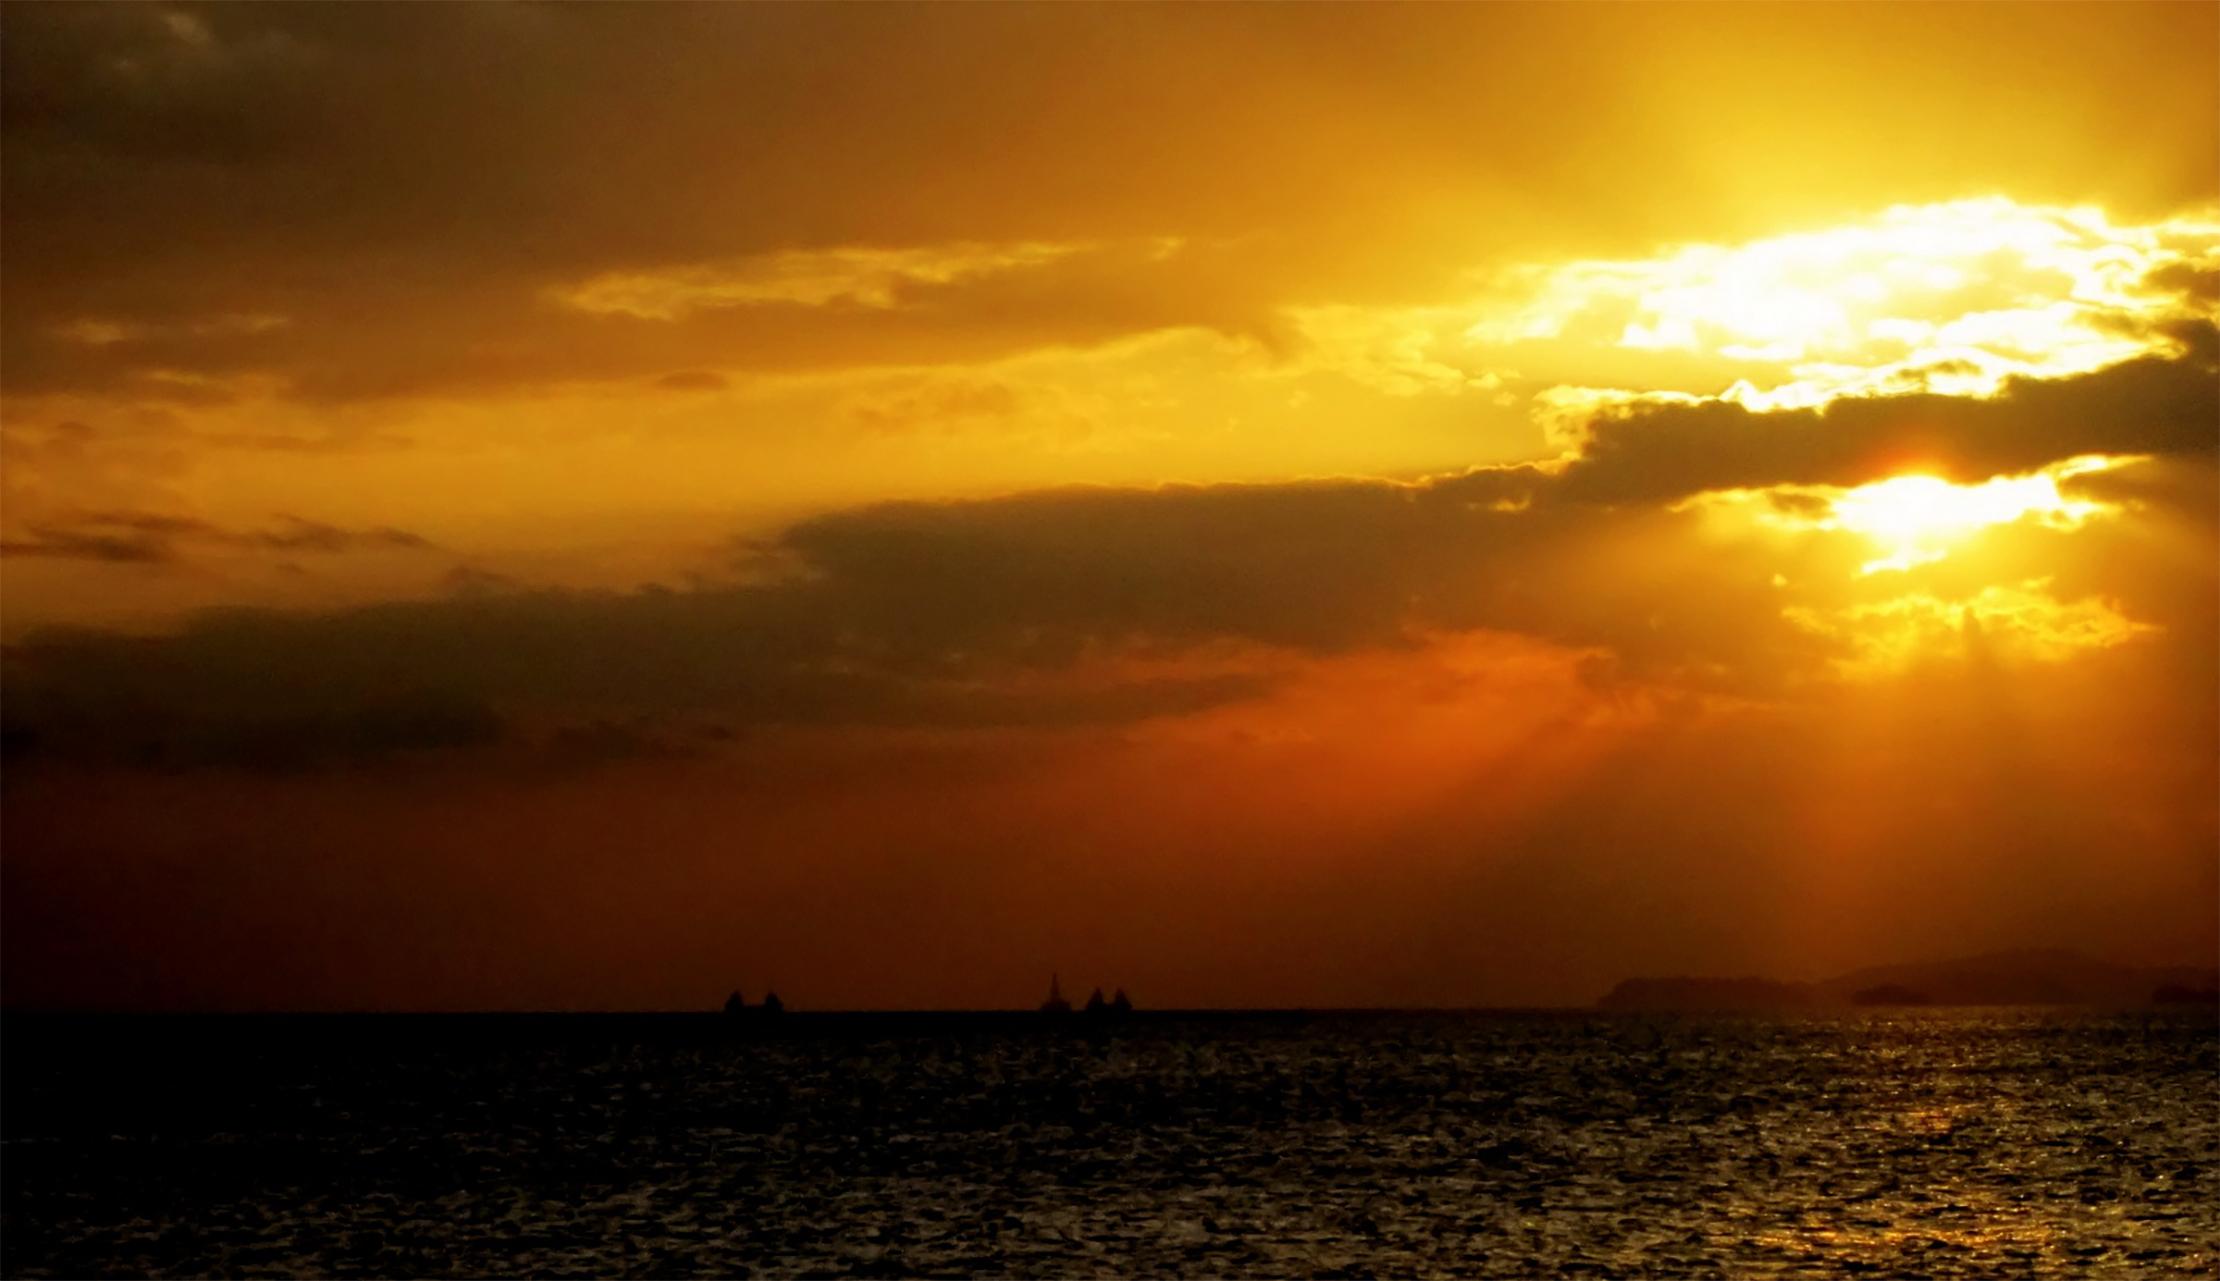 NISHLA-Design_Hyatt_Trinidad_Sunset_IMG_0013.jpg